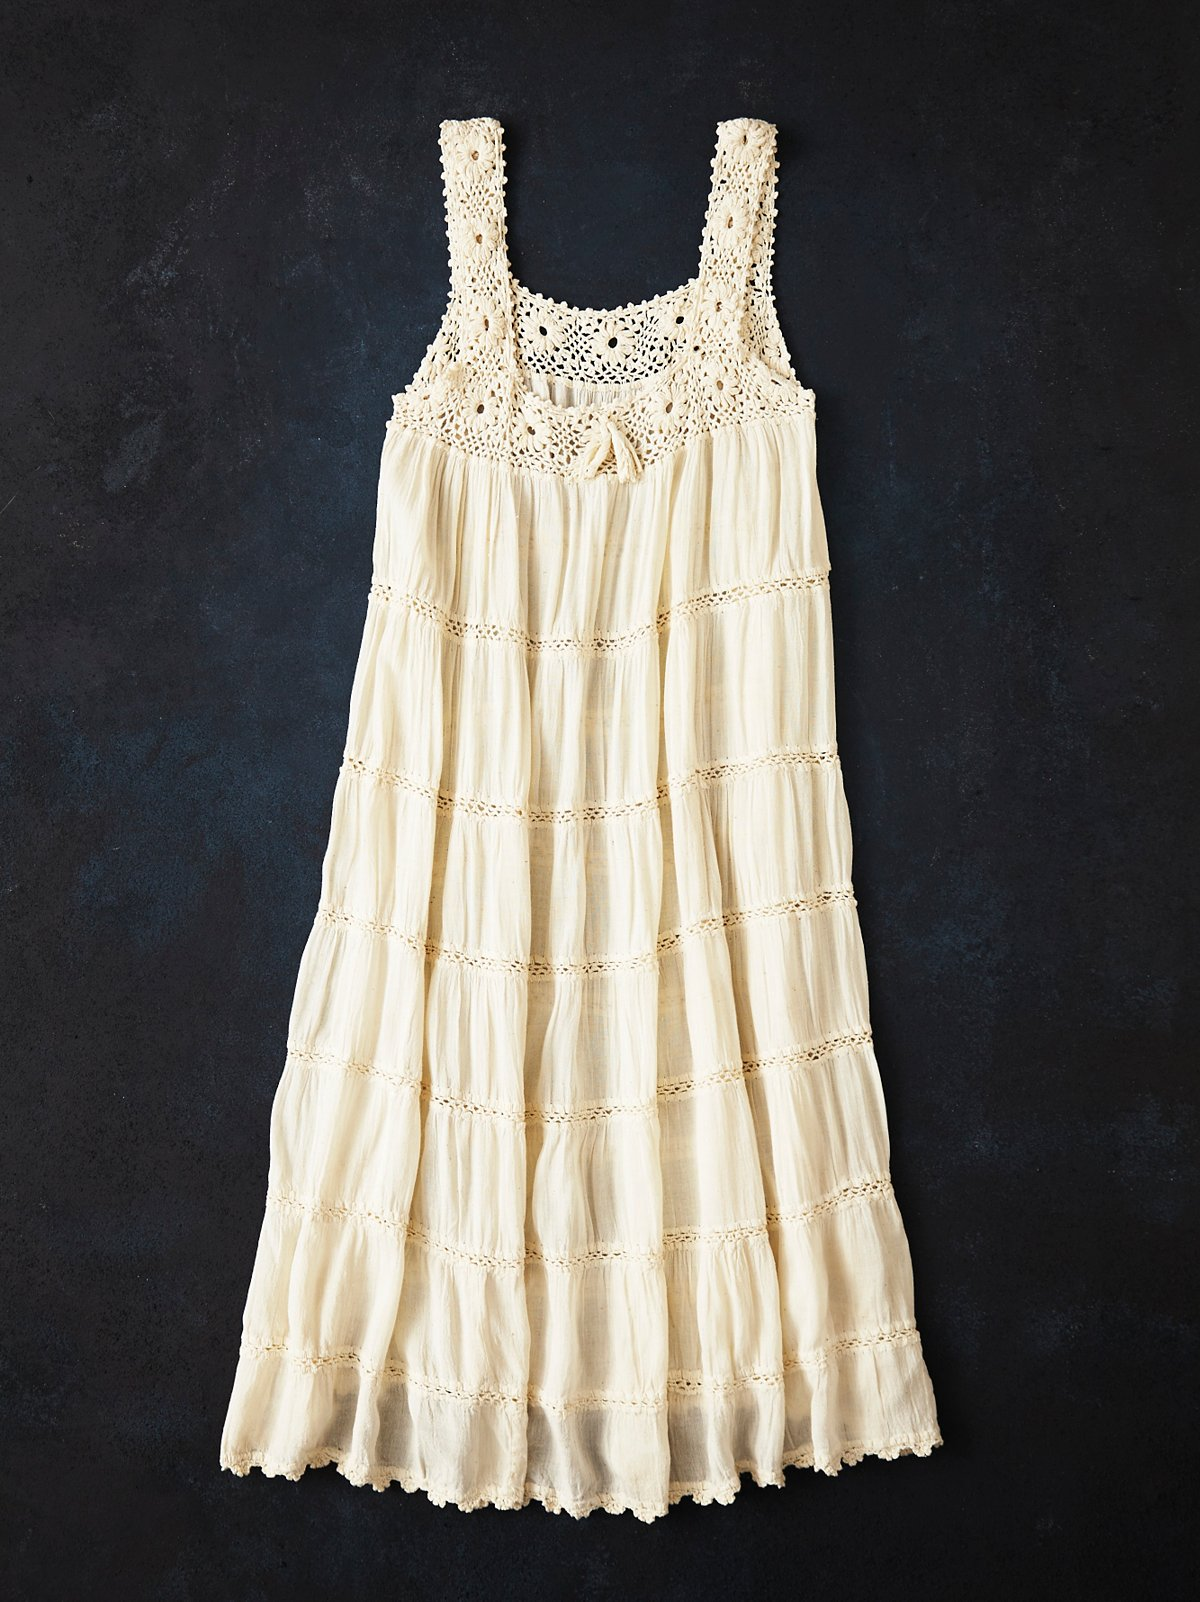 Vintage 1980s Crochet Dress